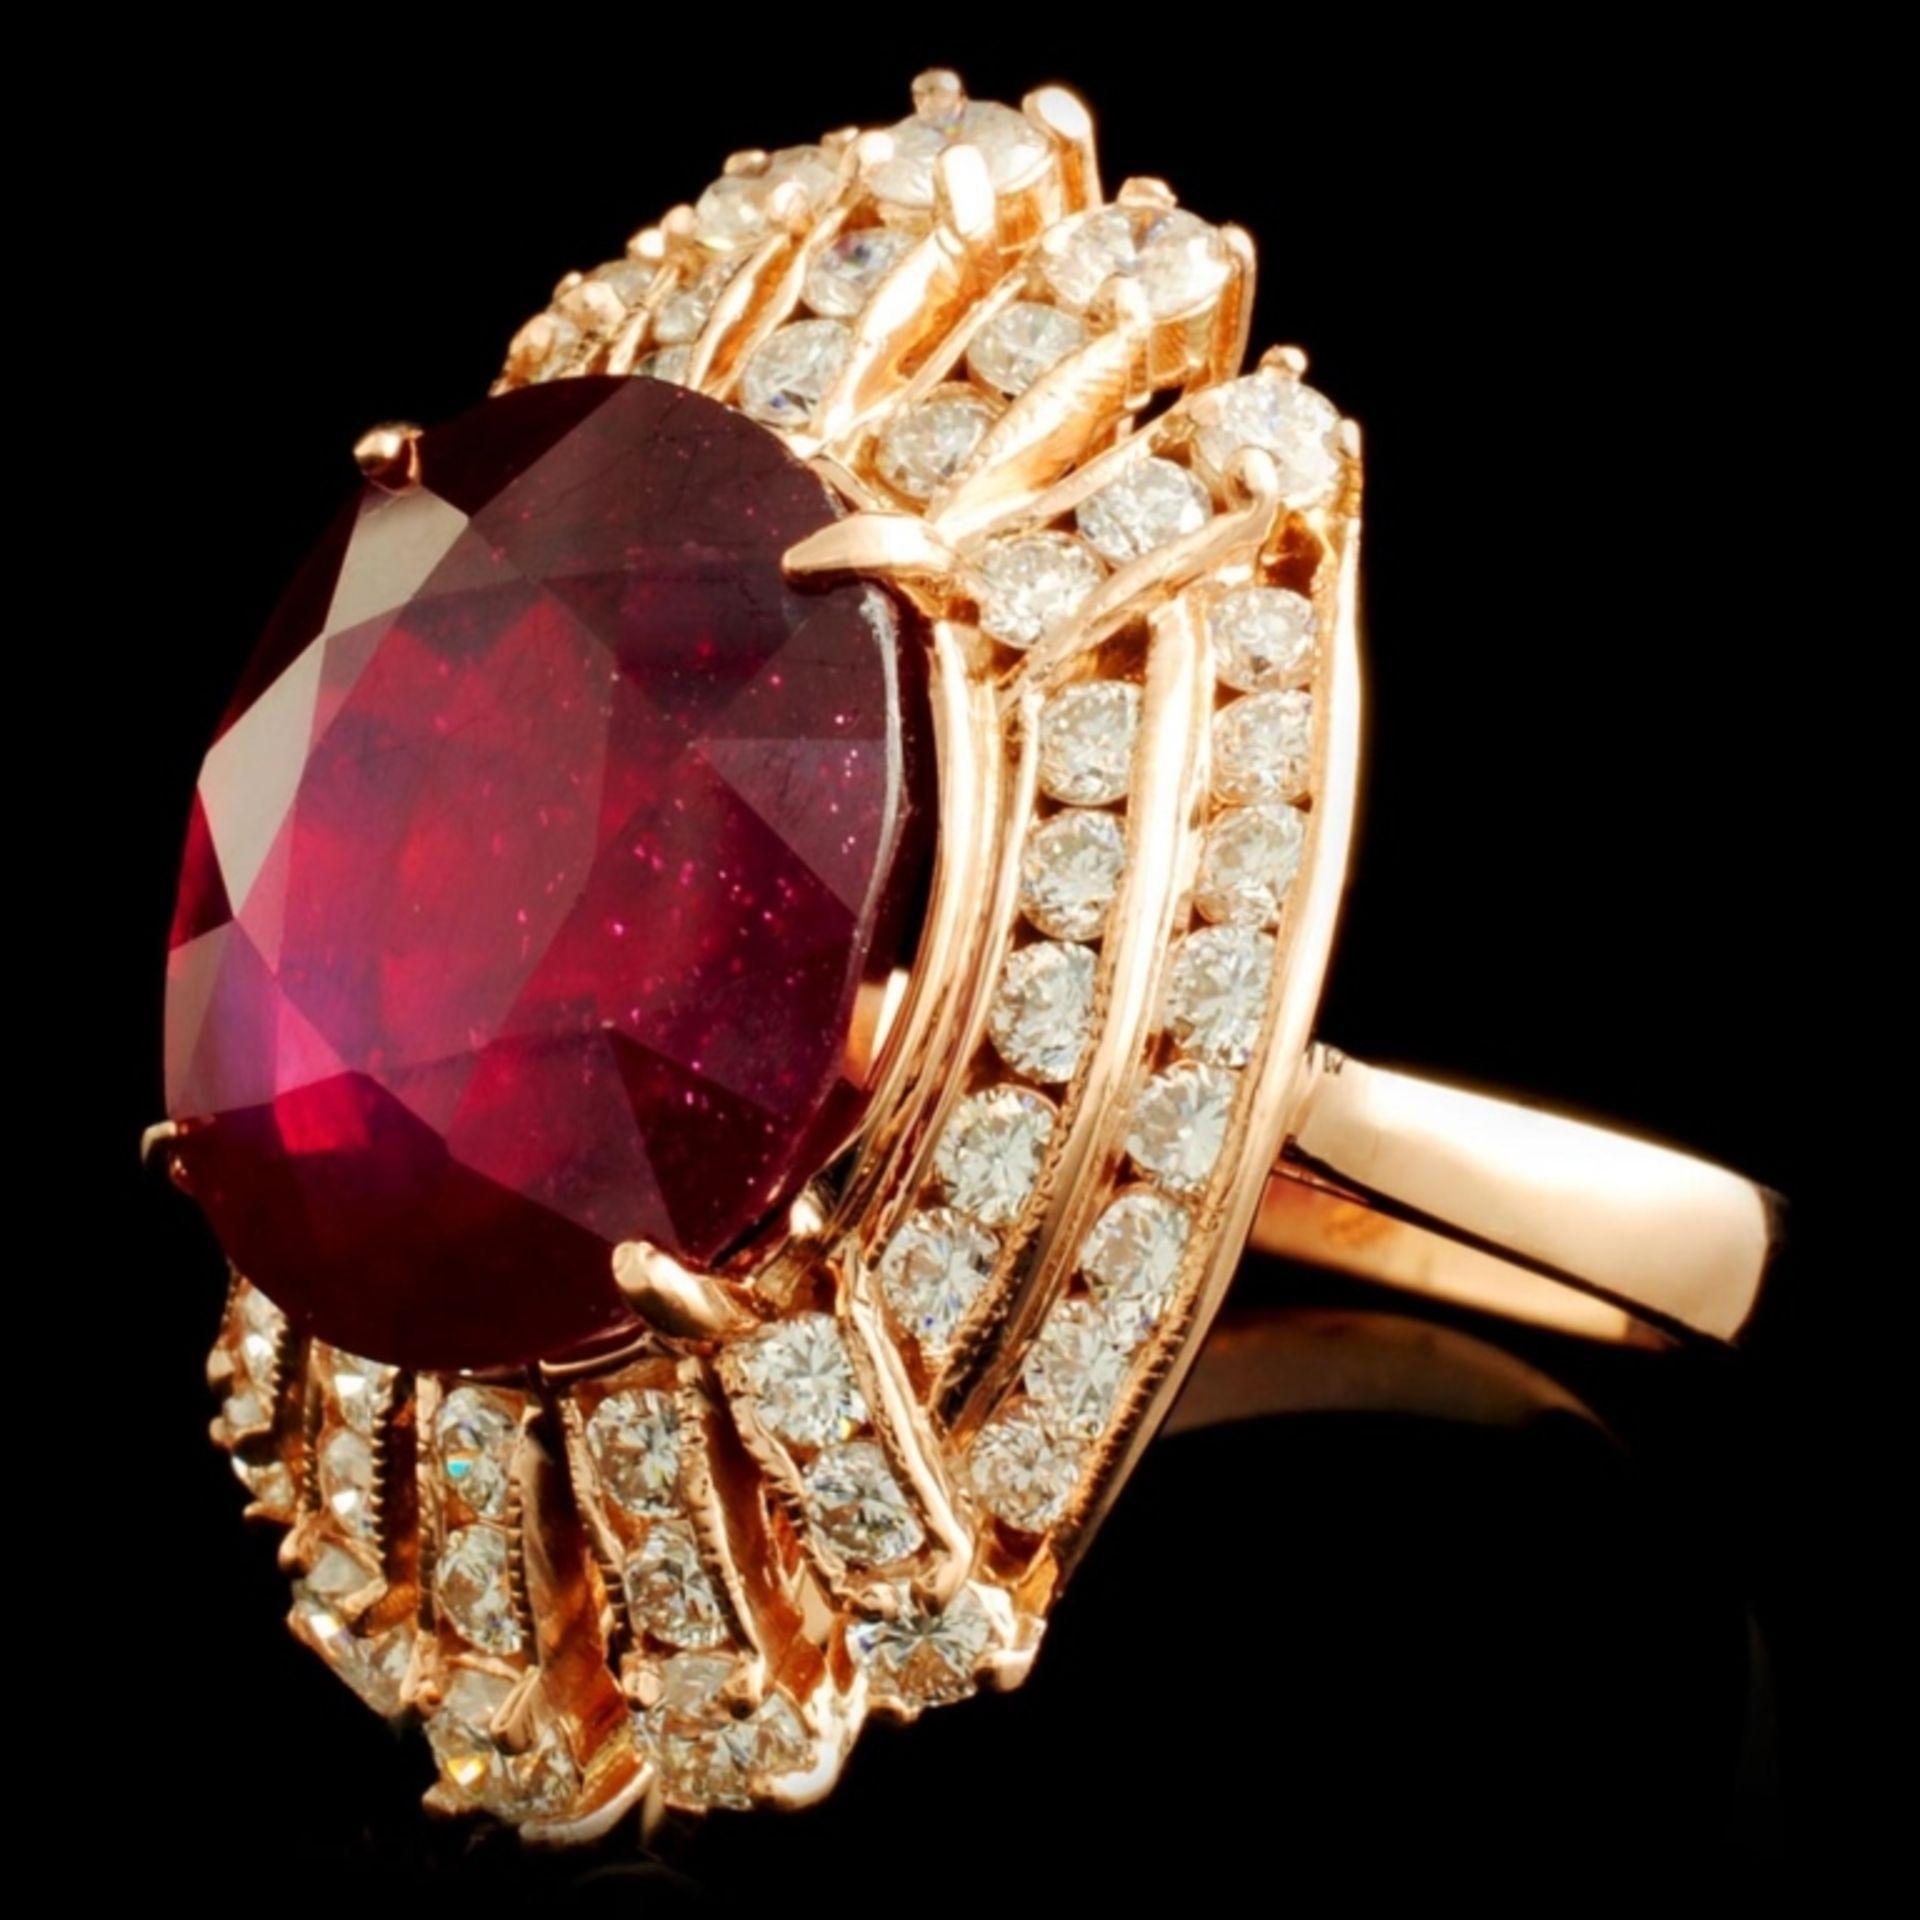 14K Gold 12.24ct Ruby & 2.02ctw Diamond Ring - Image 2 of 5